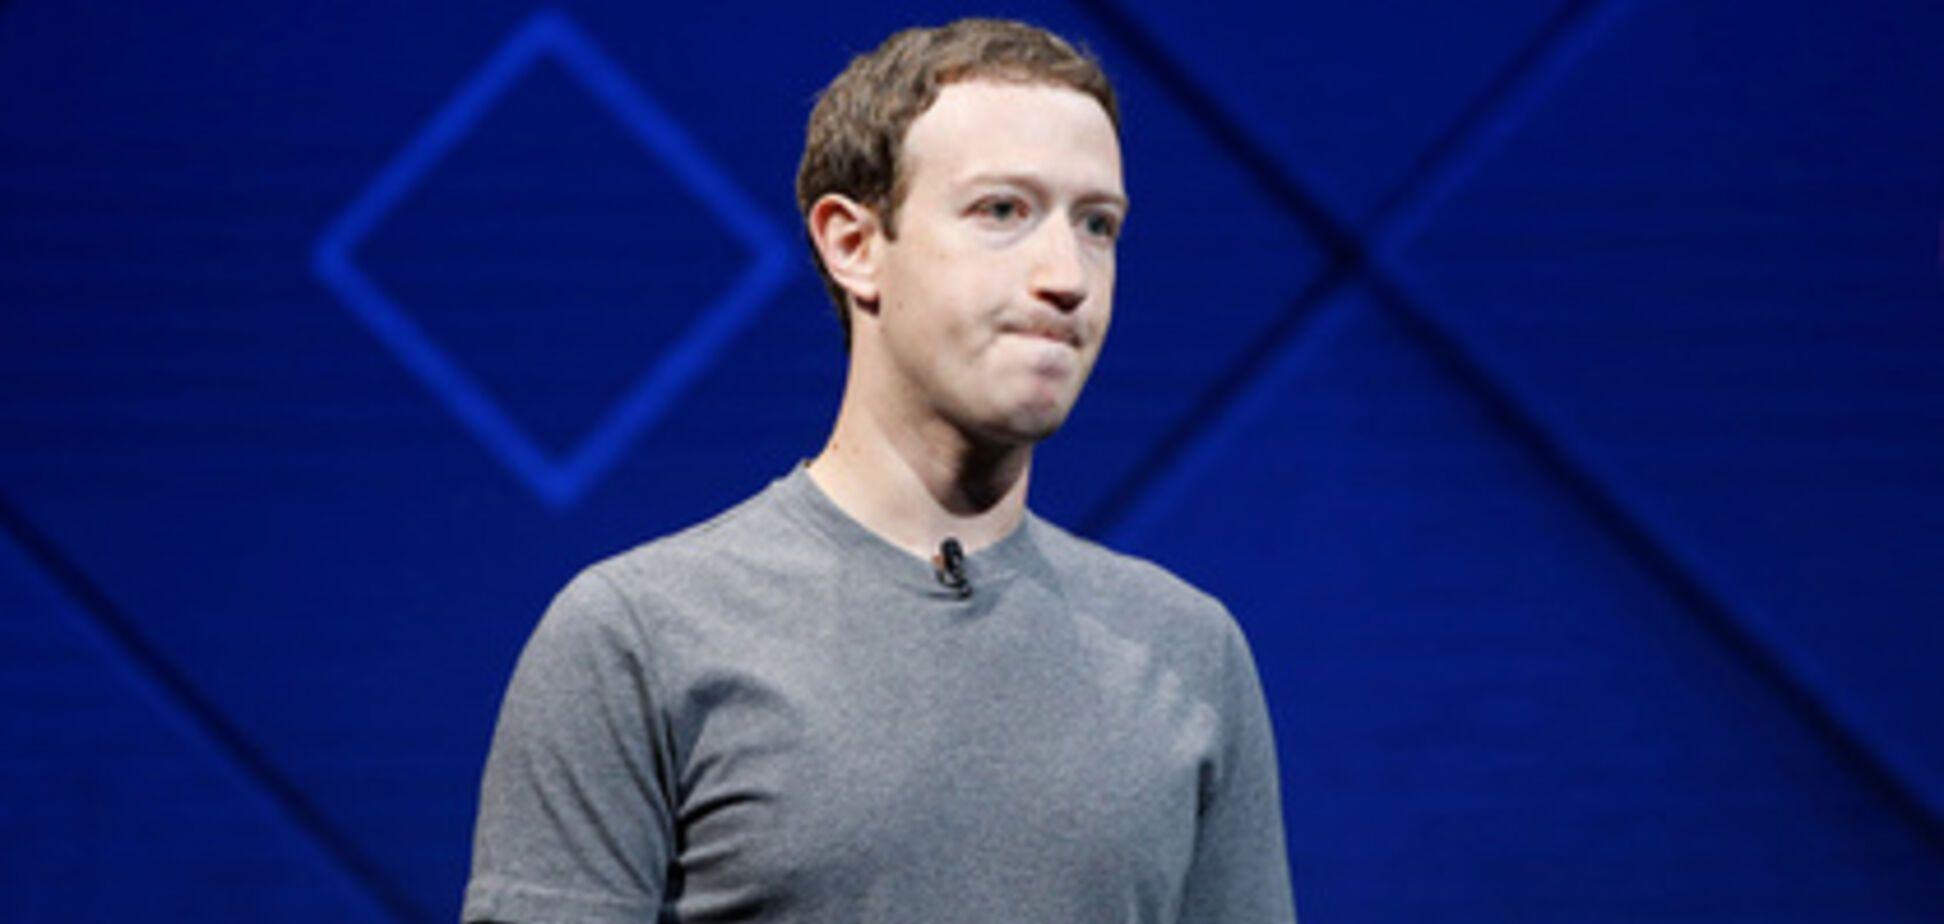 Смена алгоритмов: спецслужбы взялись за Facebook